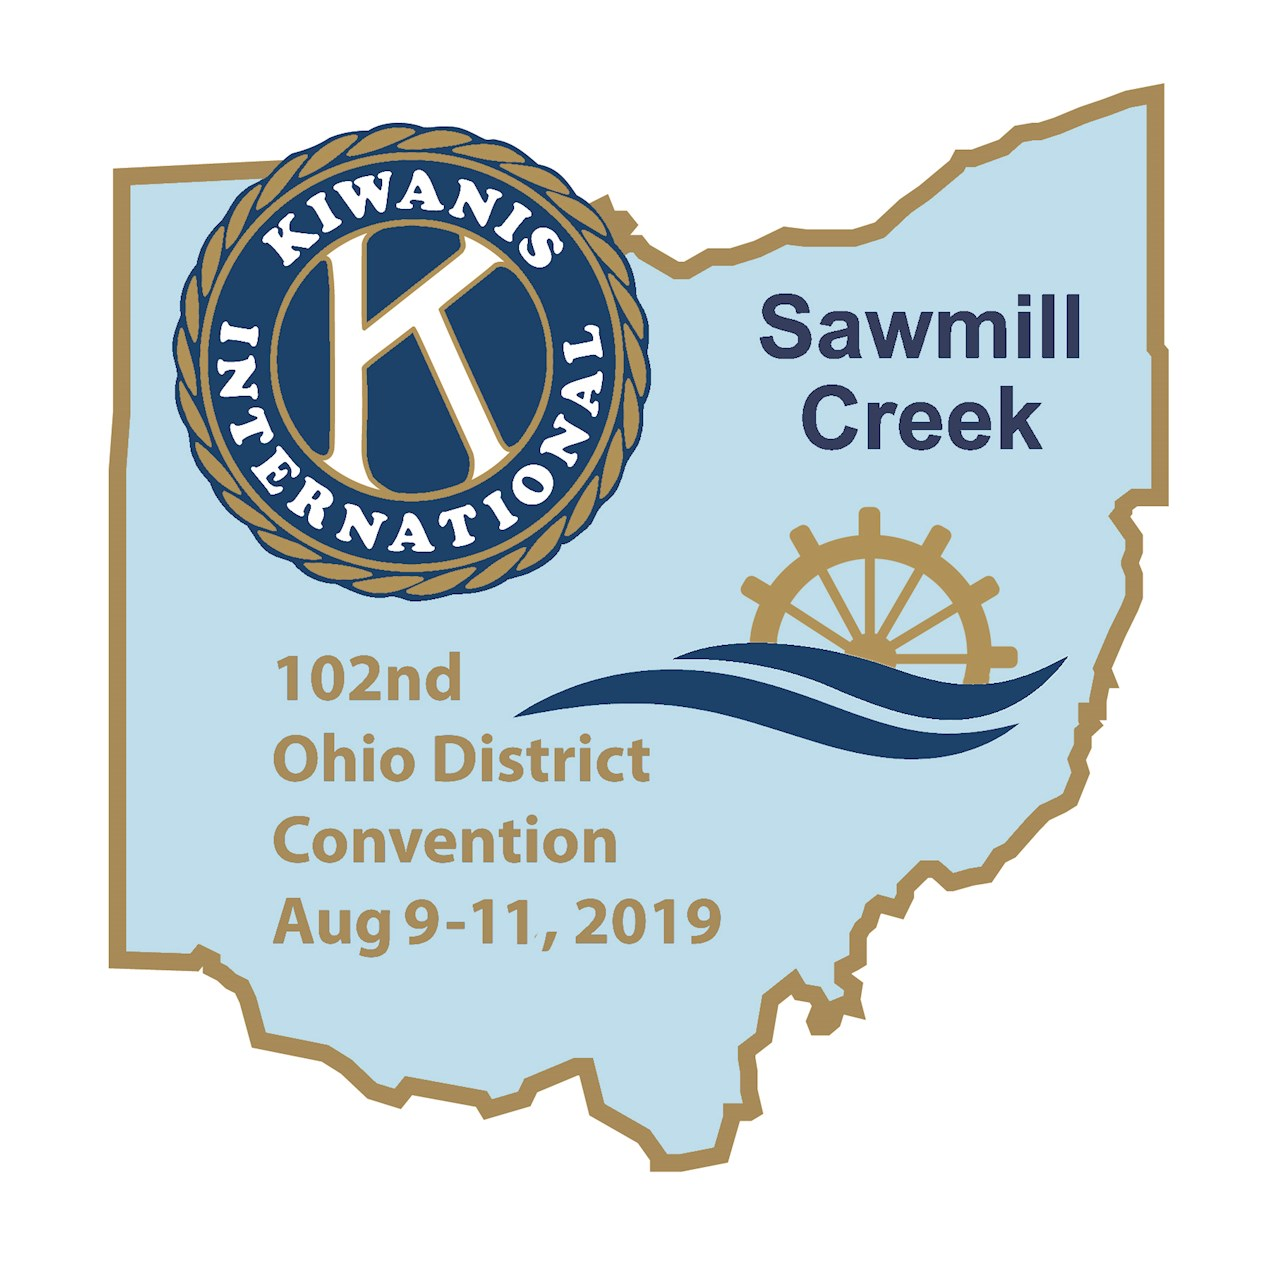 Ohio - Kiwanis International